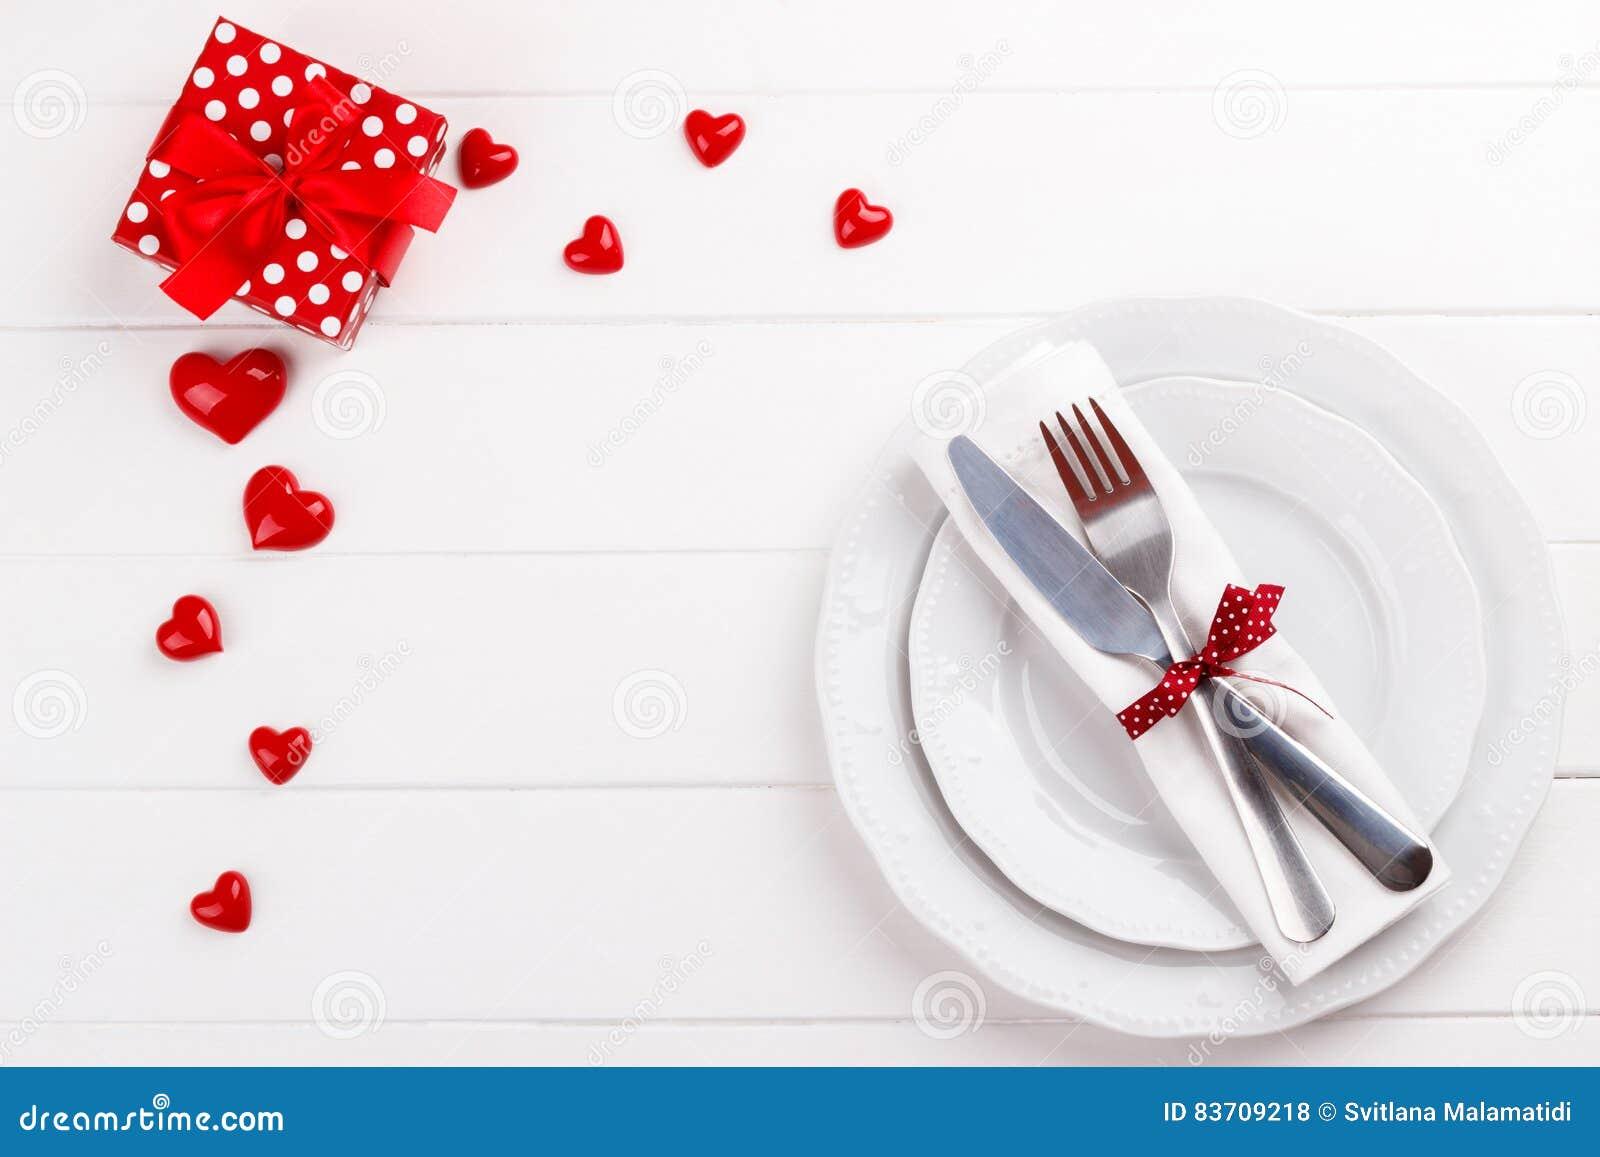 Romantic Table Setting Stock Photo Image Of Restaurant 83709218